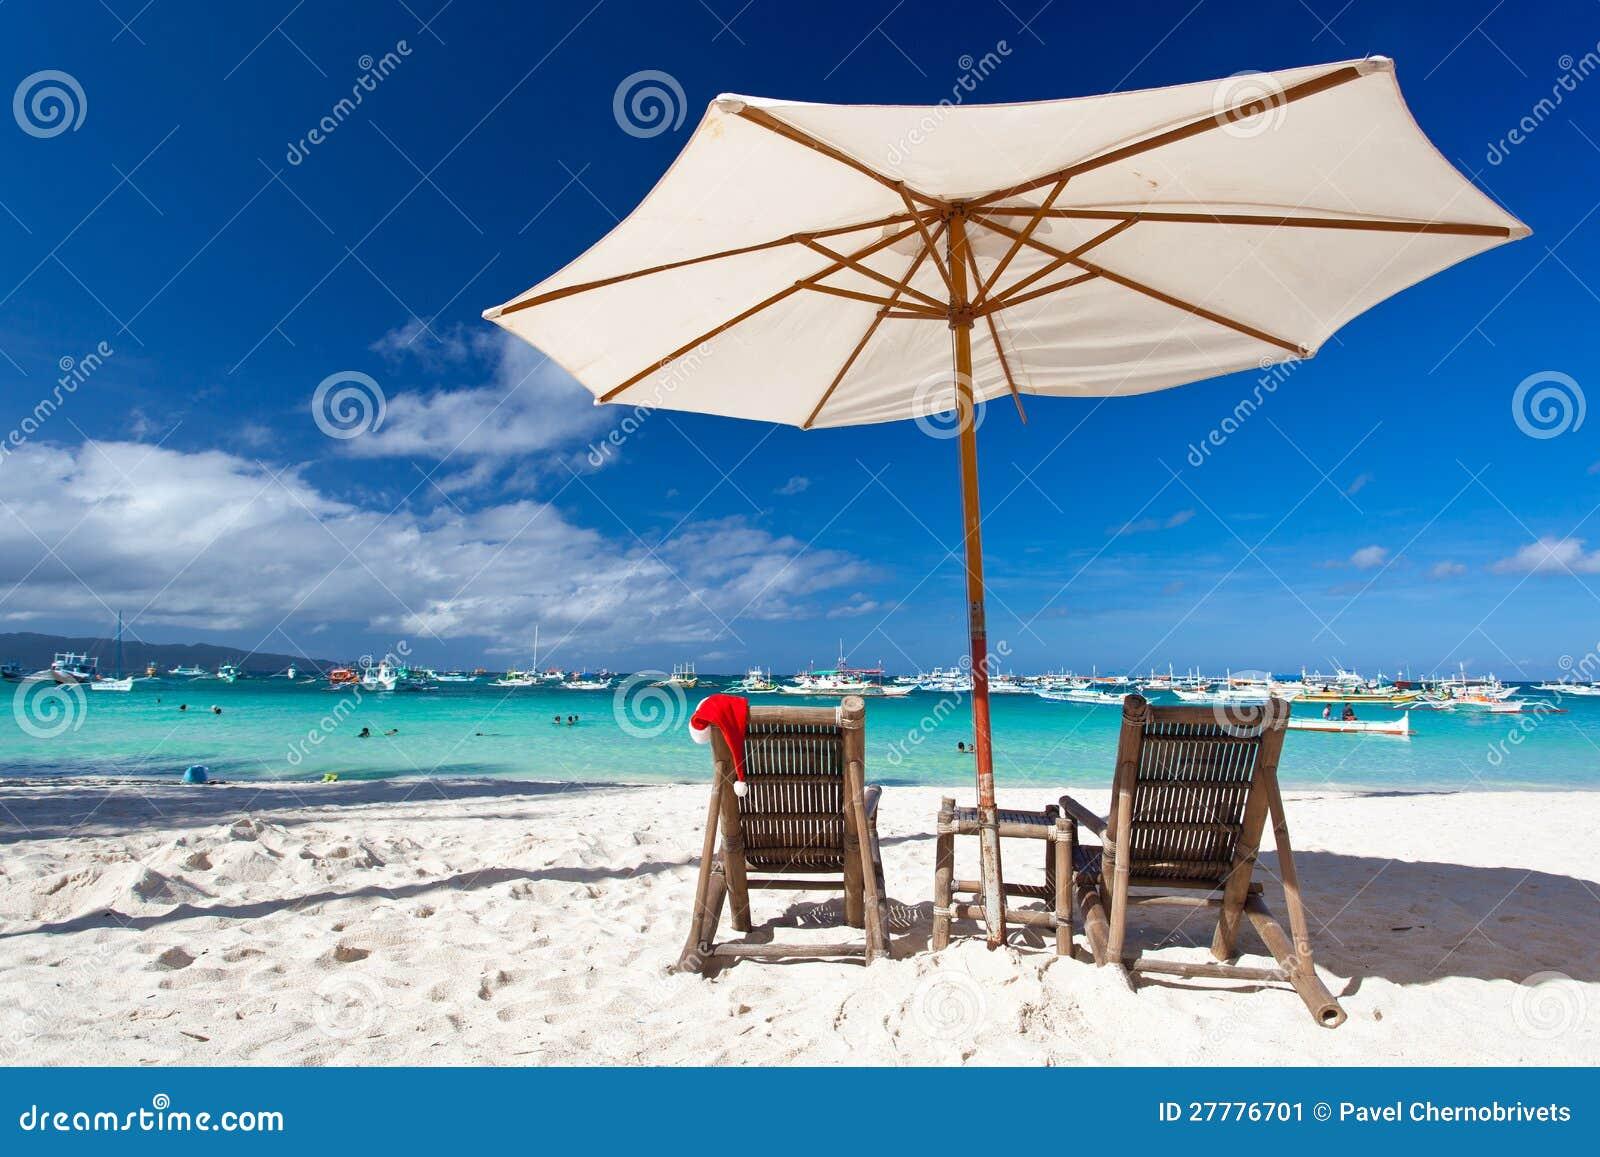 Sun Umbrella With Santa Hat Chair Stock Image Image